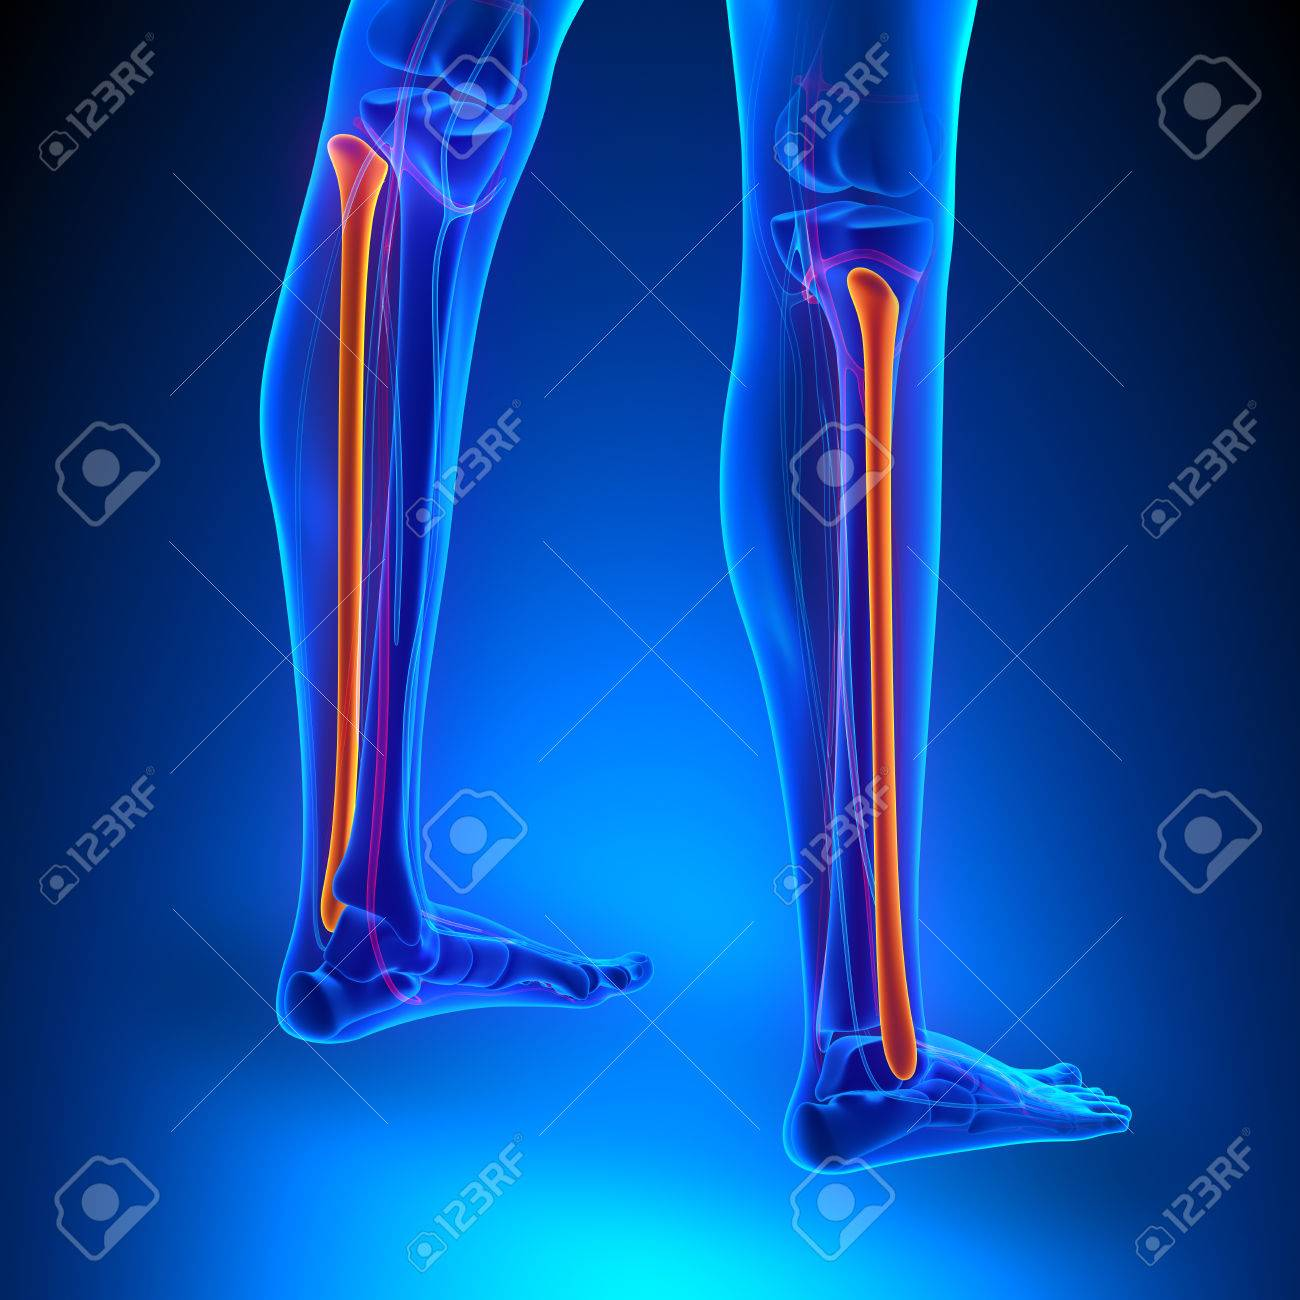 Fibula Bone Anatomy With Circulatory System Stock Photo, Picture And ...